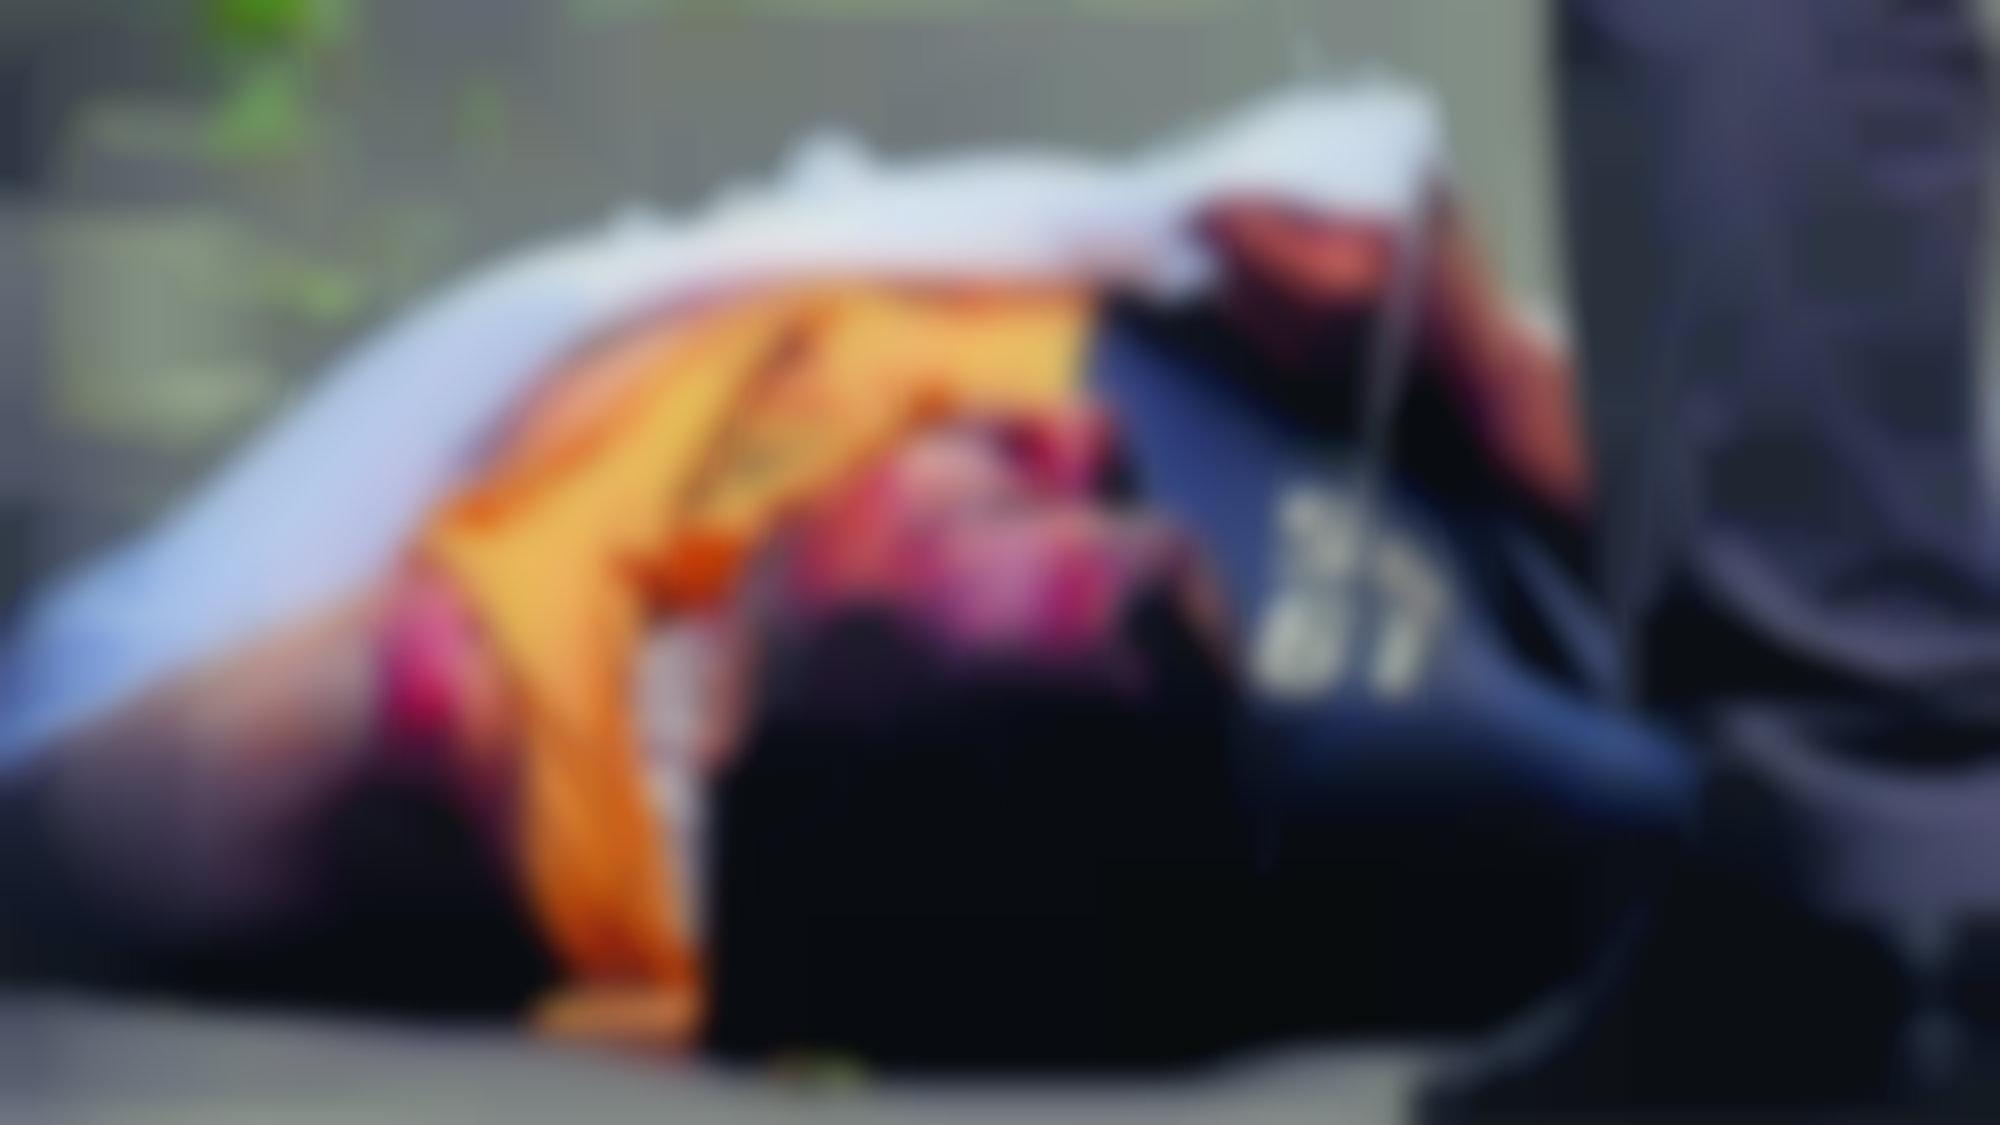 Muere Hombre Tropiezo Accidente CDMX Iztapalapa